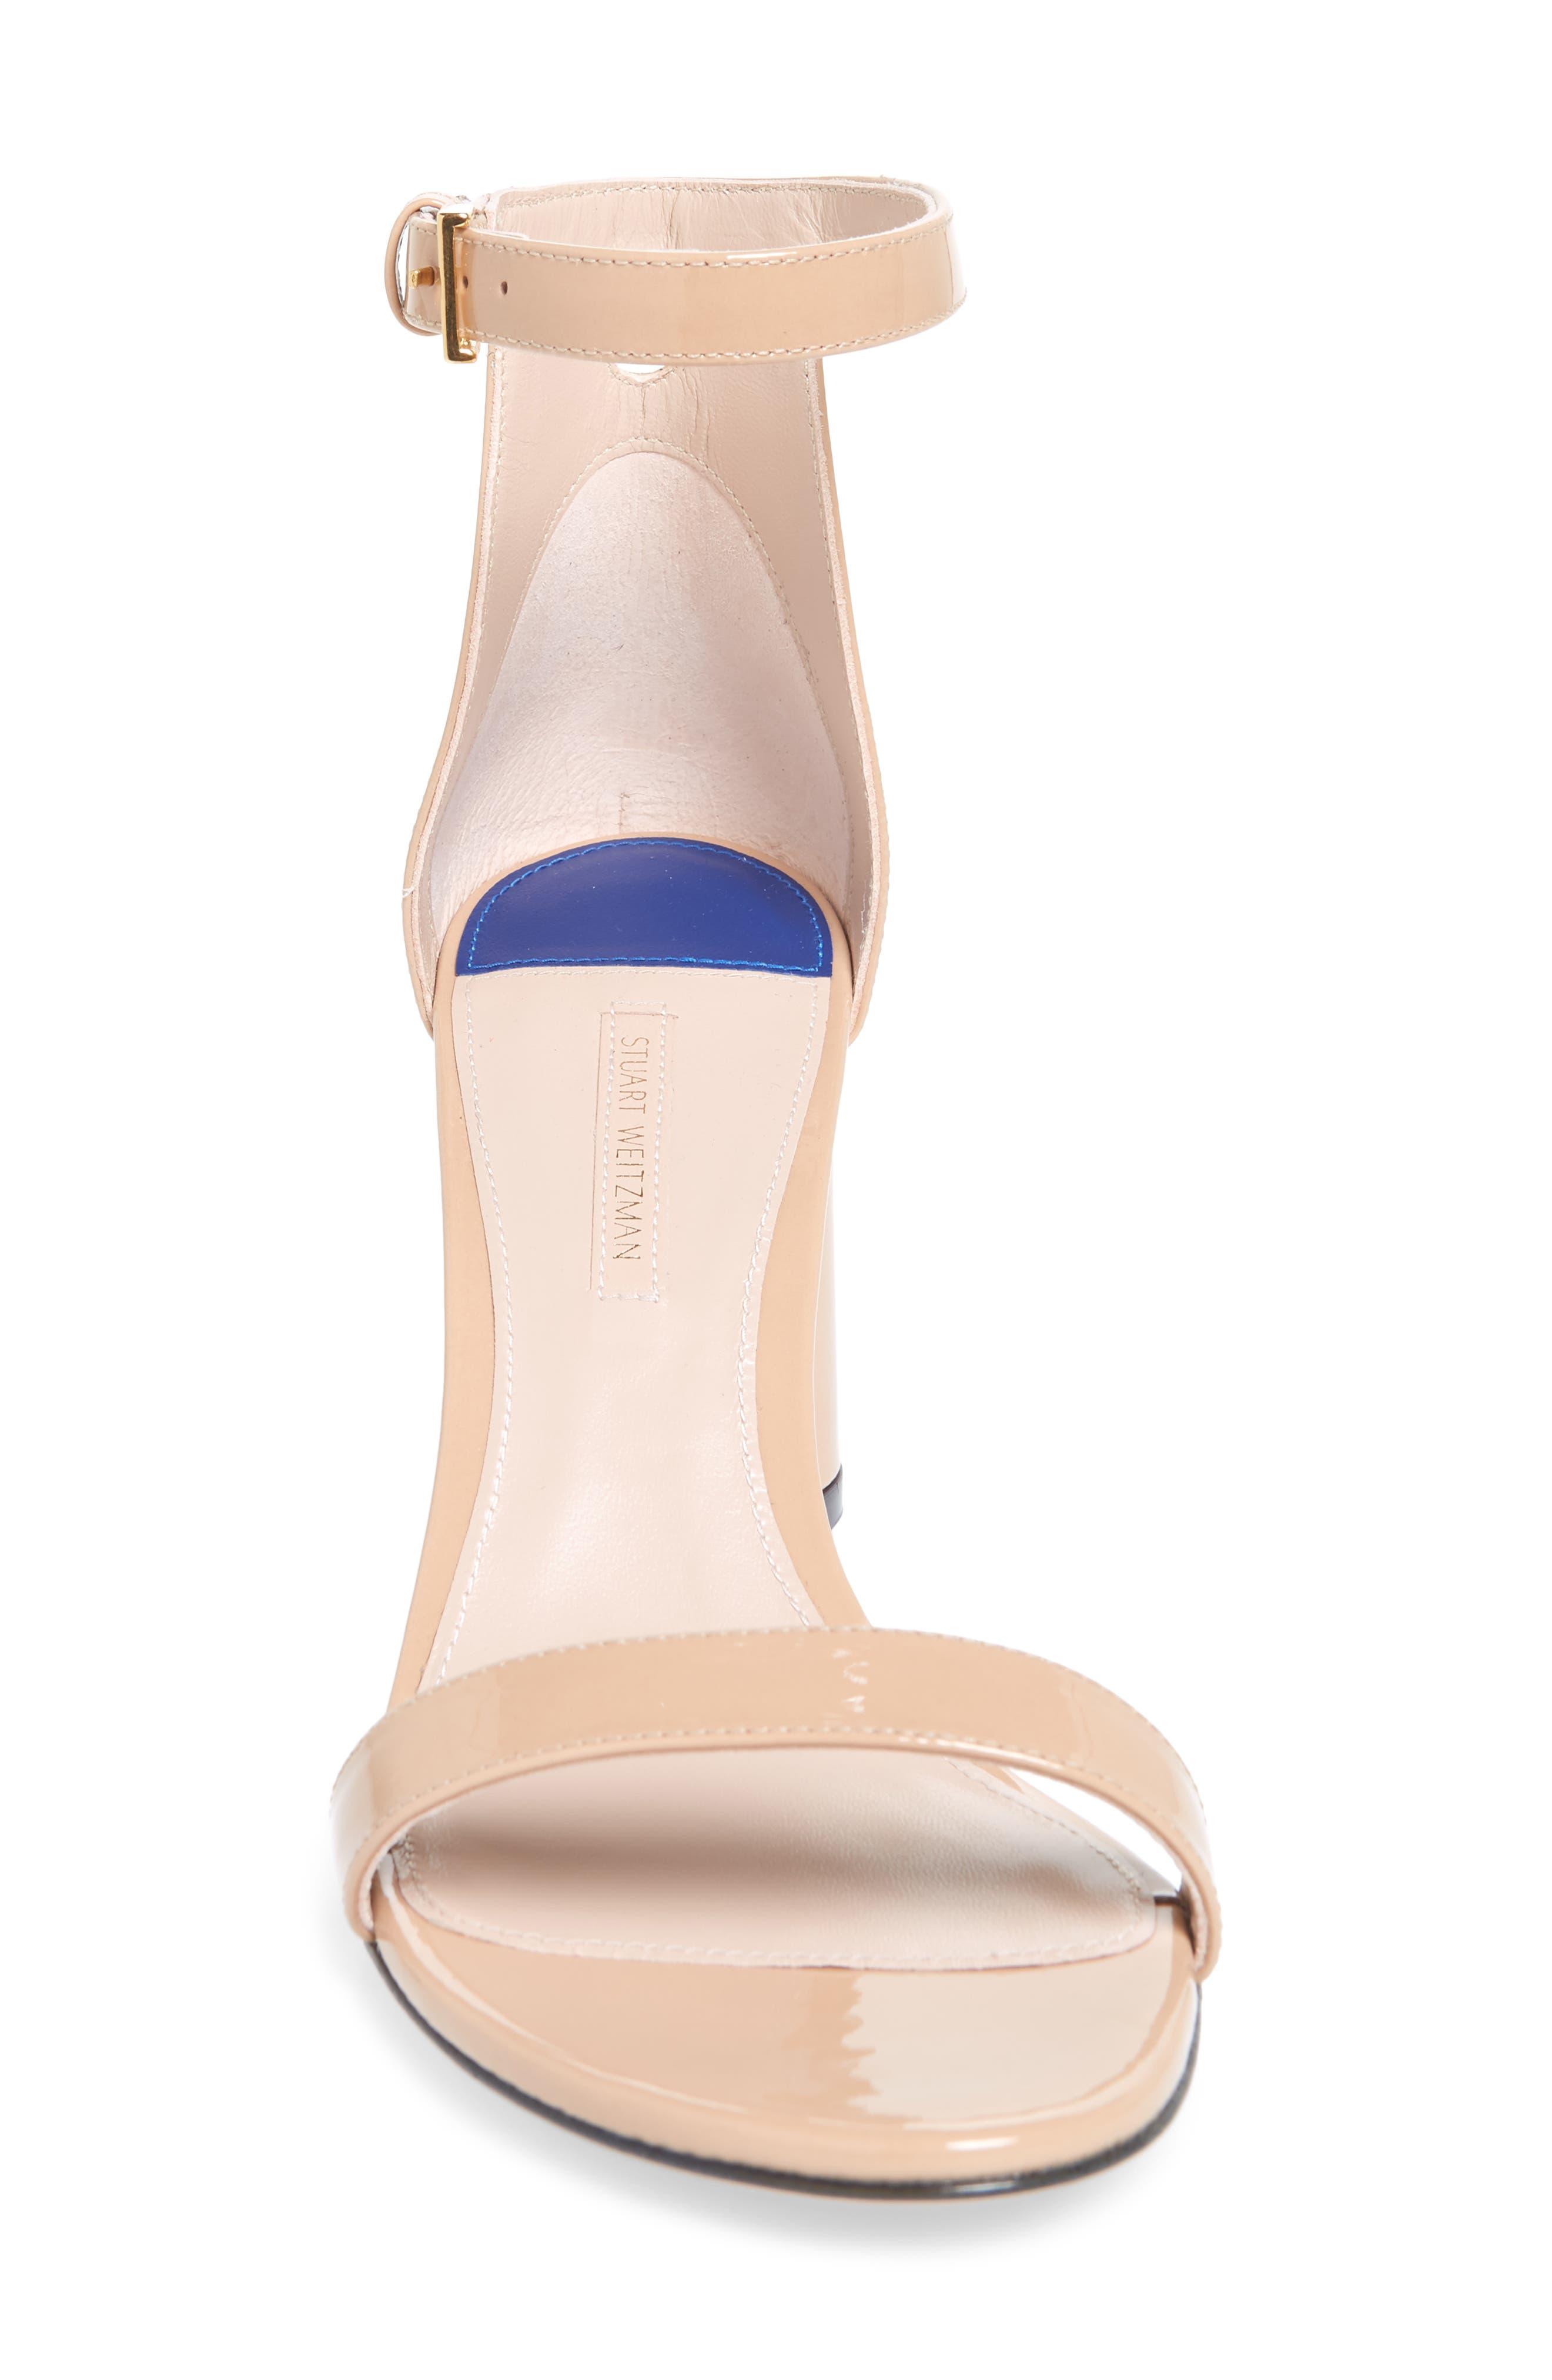 75LESSNUDIST Ankle Strap Sandal,                             Alternate thumbnail 4, color,                             ADOBE CRISTAL